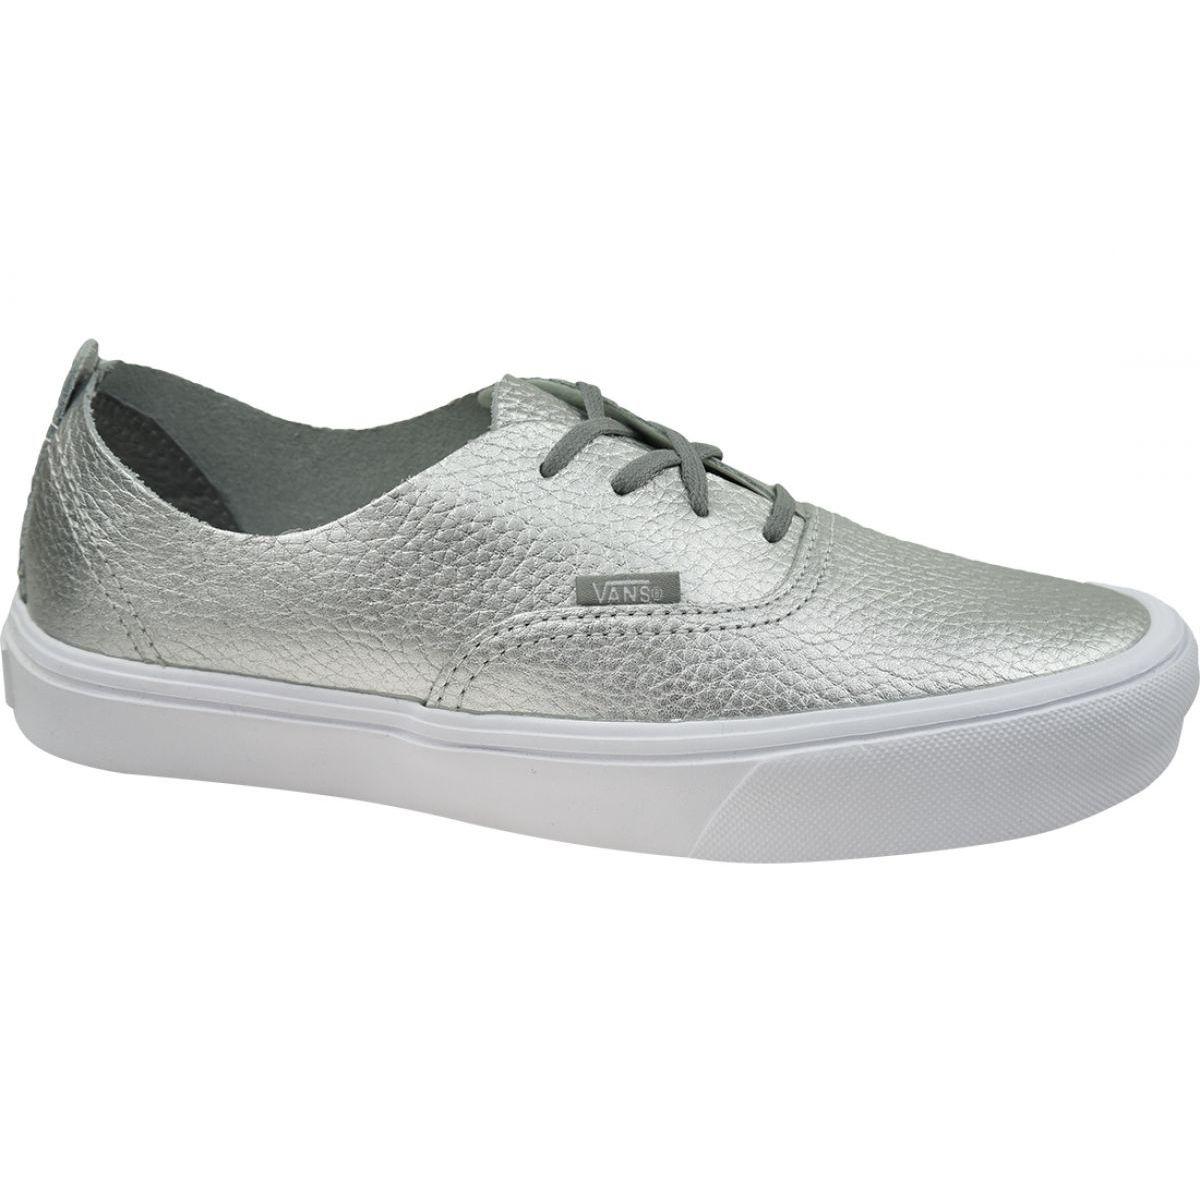 Vans Authentic Decon W Va38ern5k Shoes Grey Vans Authentic Decon Vans Authentic Shoes